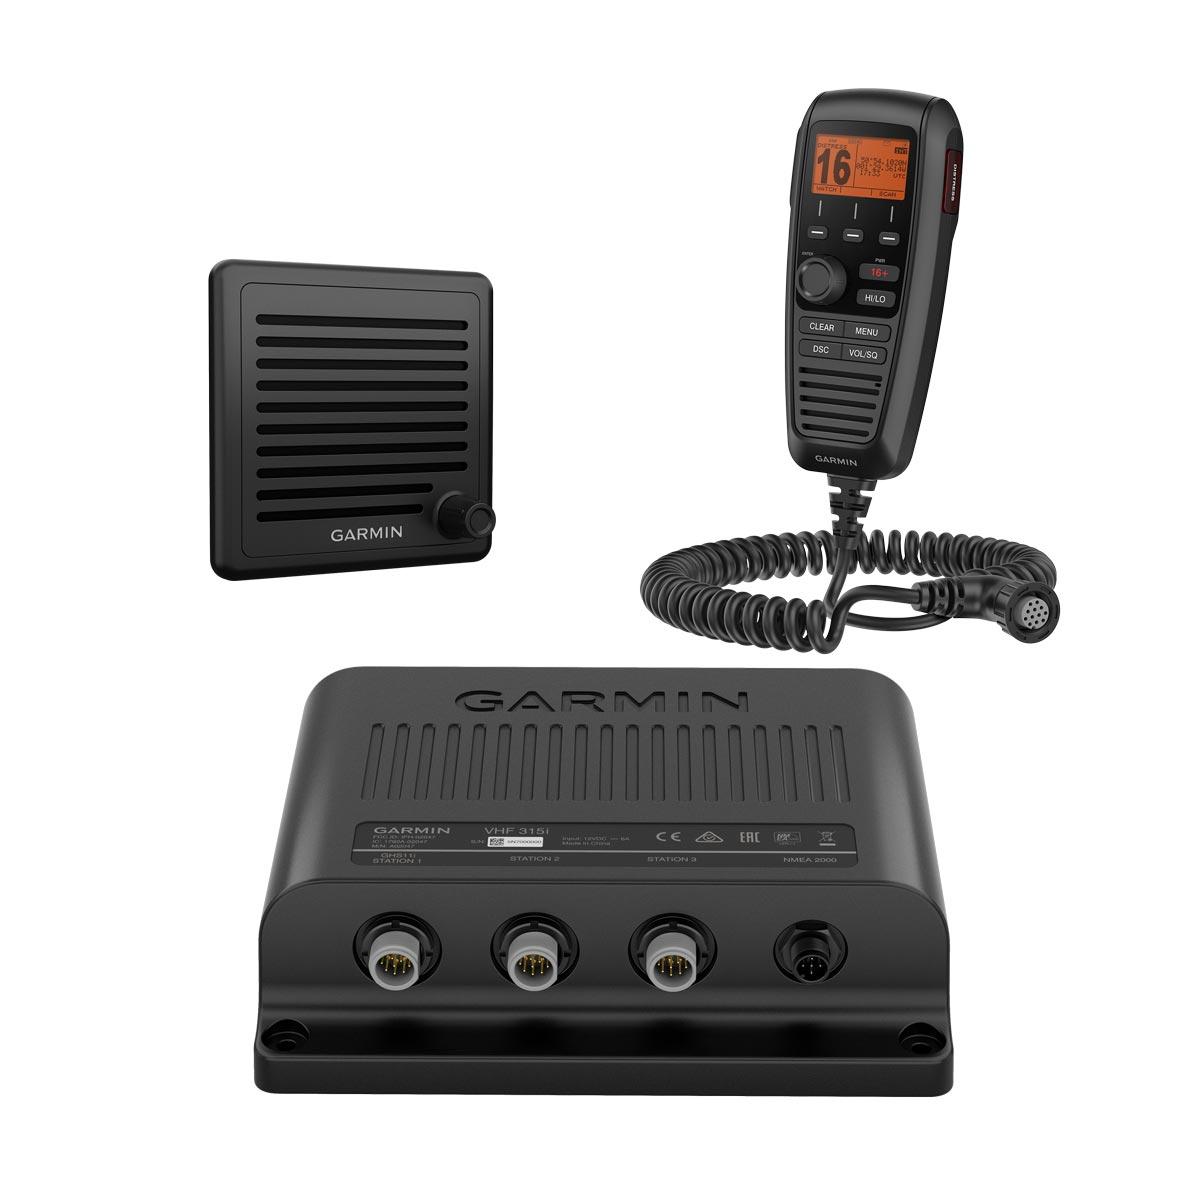 Garmnin VHF 315i Blackbox See-/Binnenfunkanlage